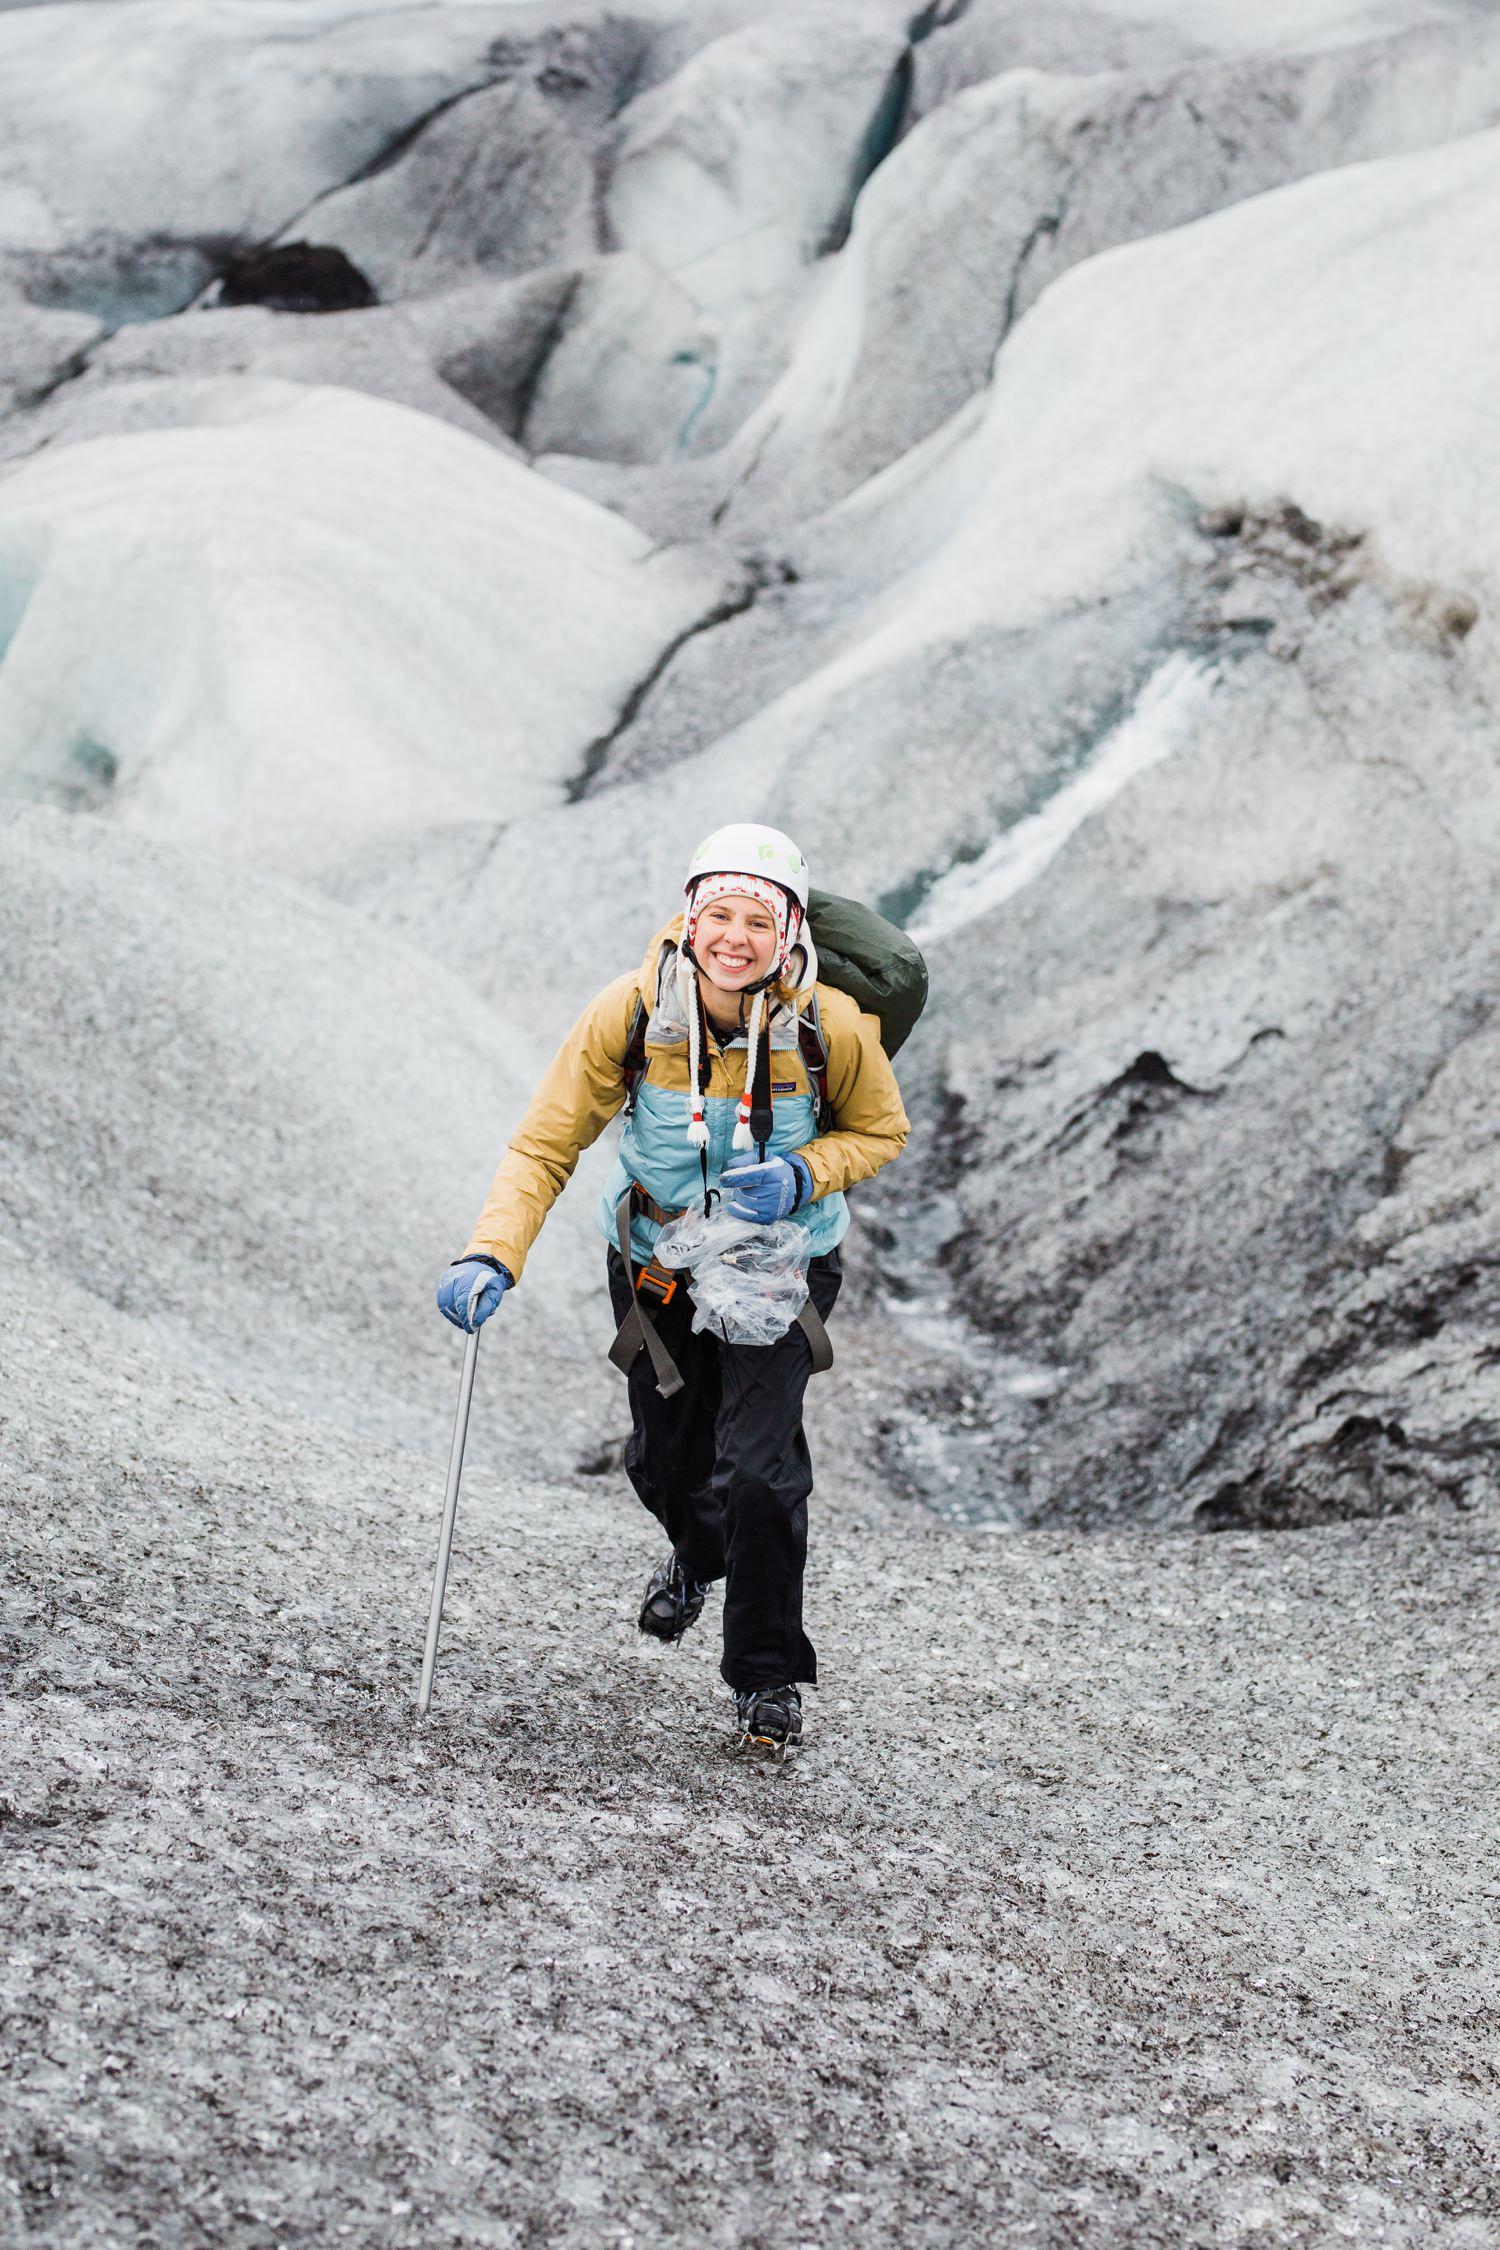 cameron-zegers-travel-photographer-nat-geo-student-expeditions-glacier.jpg